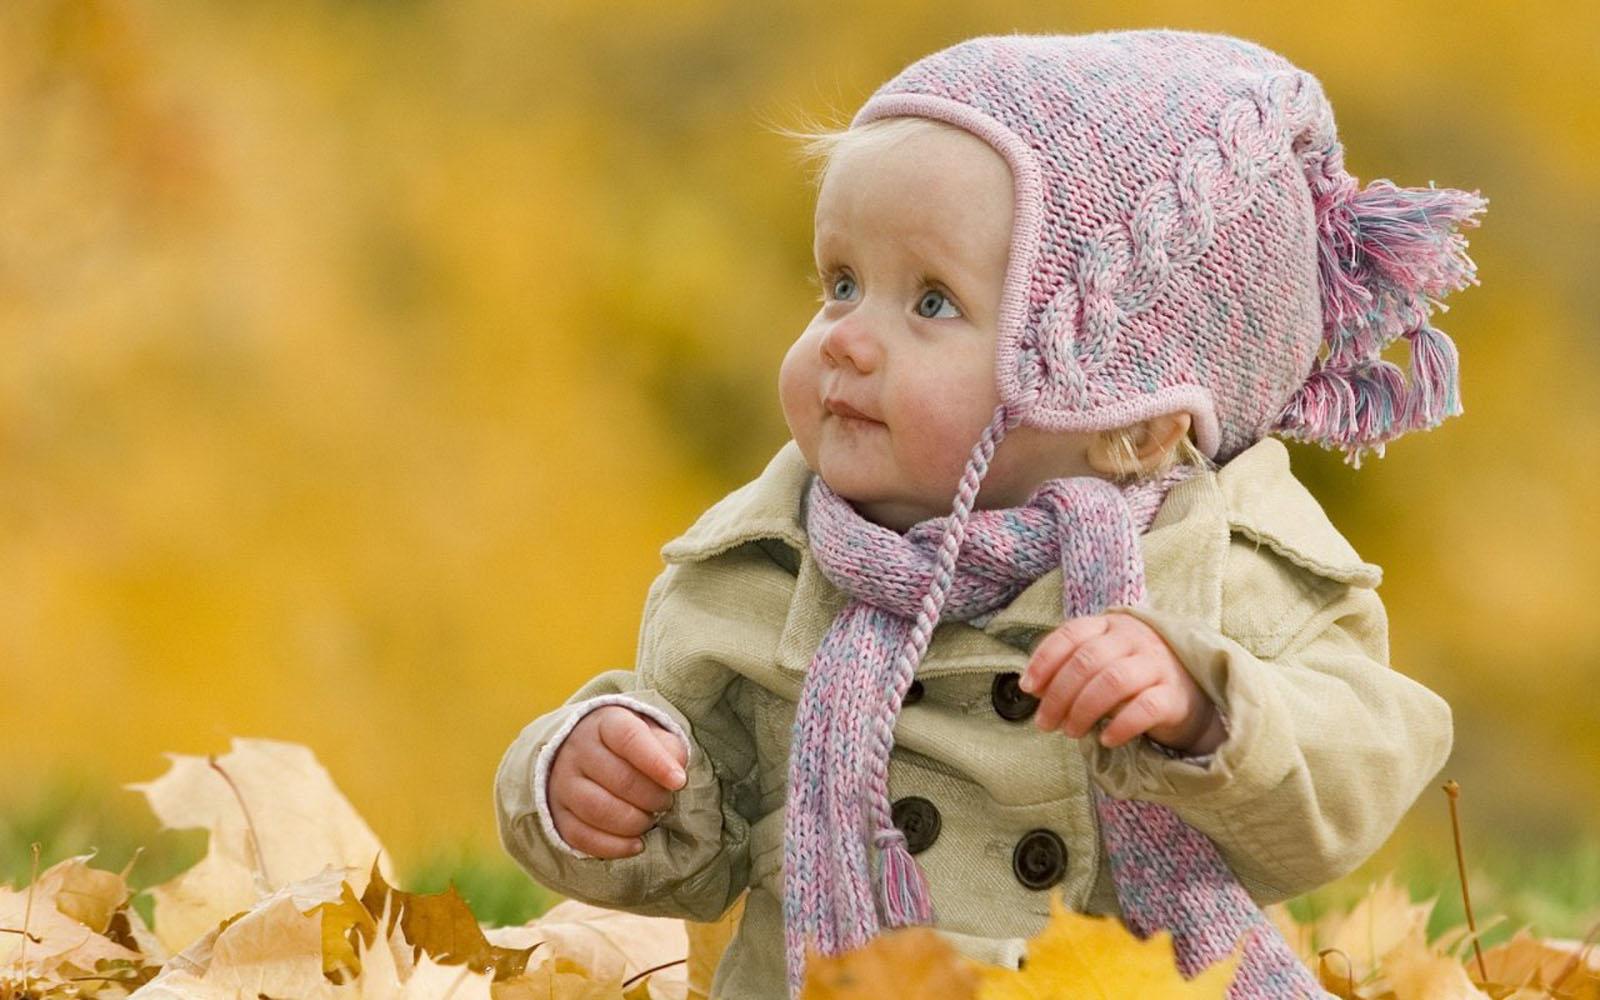 Cute babies hd wallpapers HD Wallpaper 1600x1000